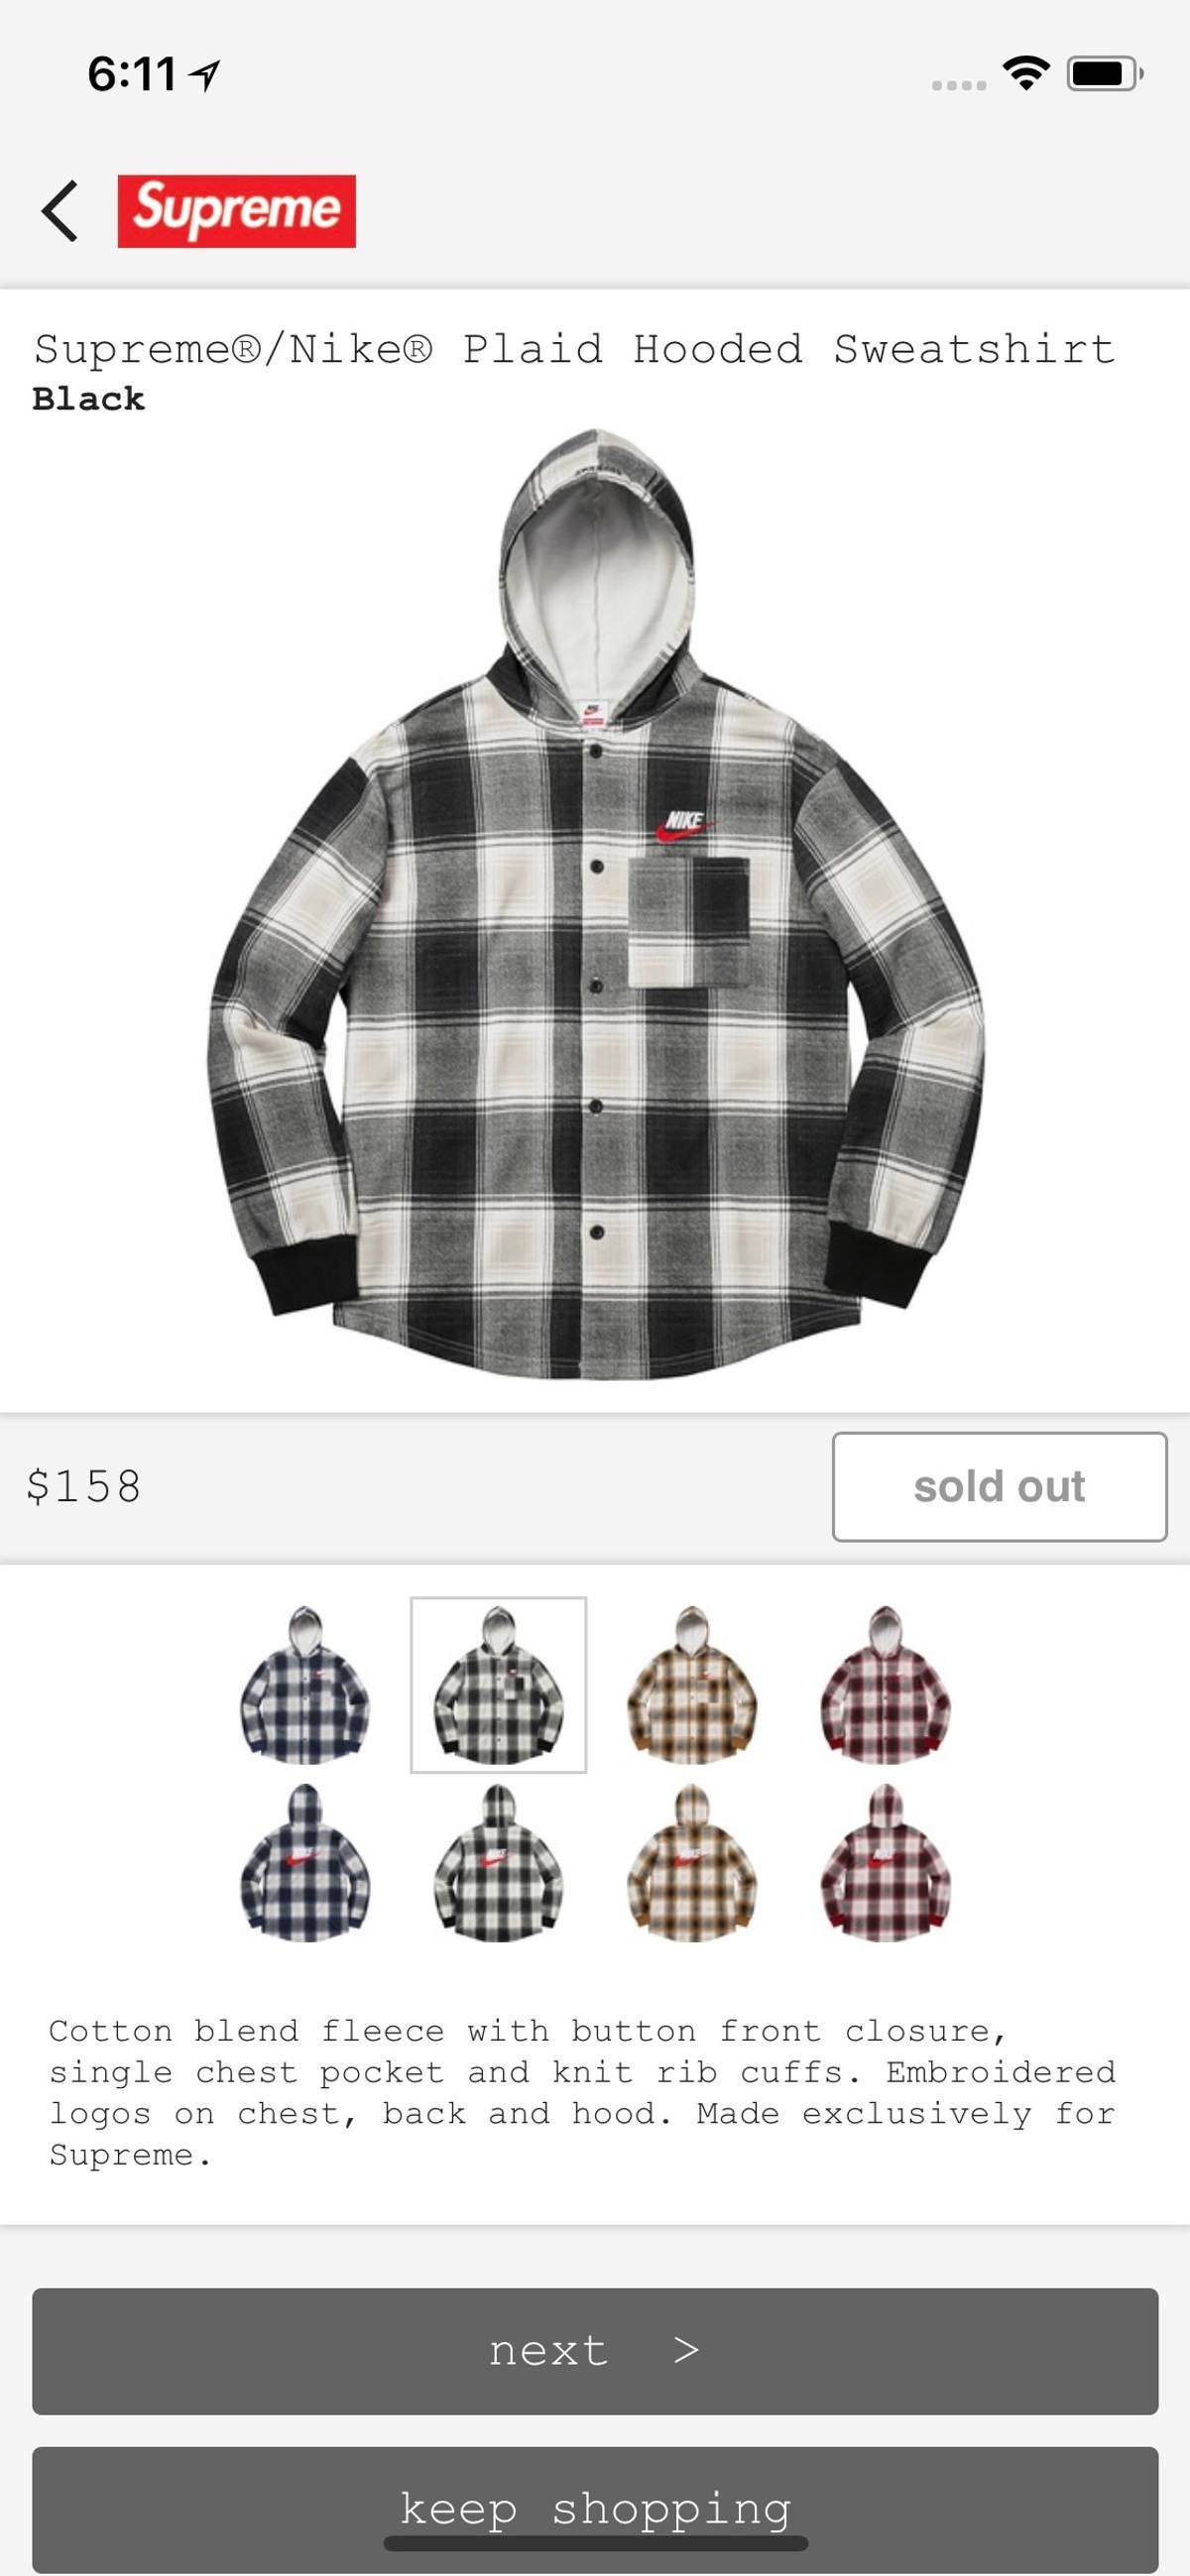 best service structural disablities amazing price Nike × Supreme Nike Supreme Plaid Hooded Sweatshirt Size M $194